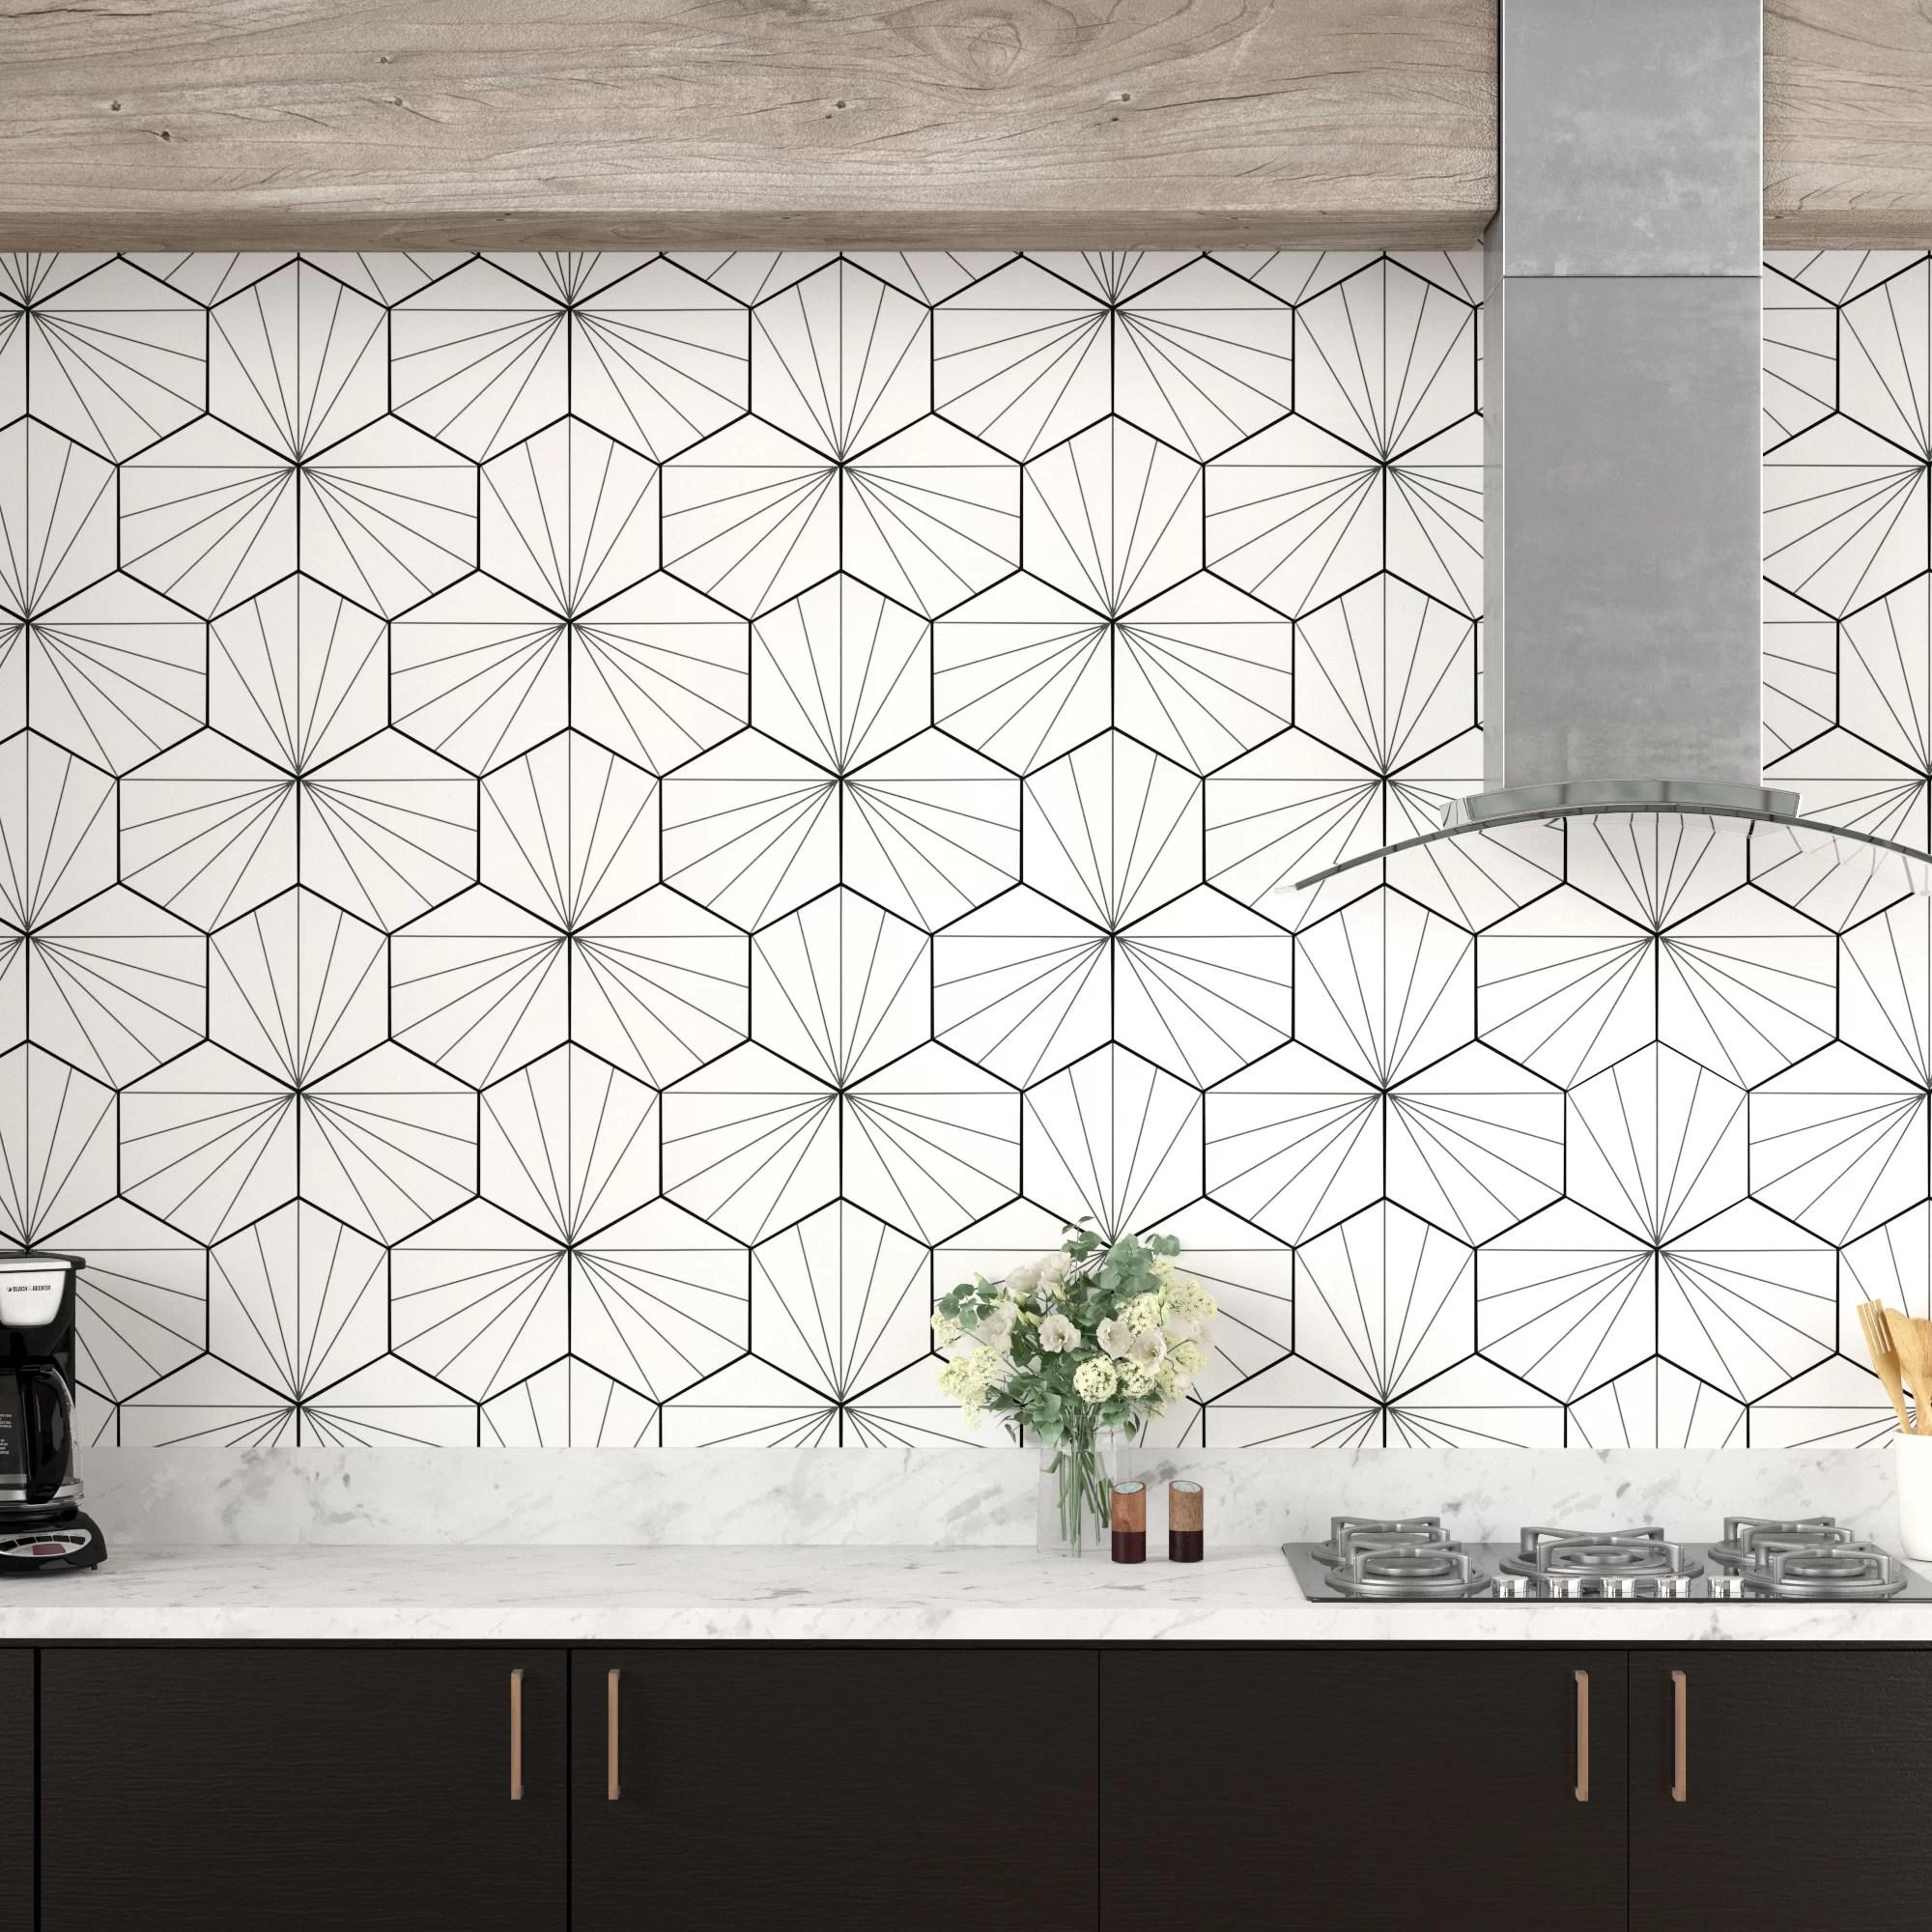 patterned floor tiles wall tiles